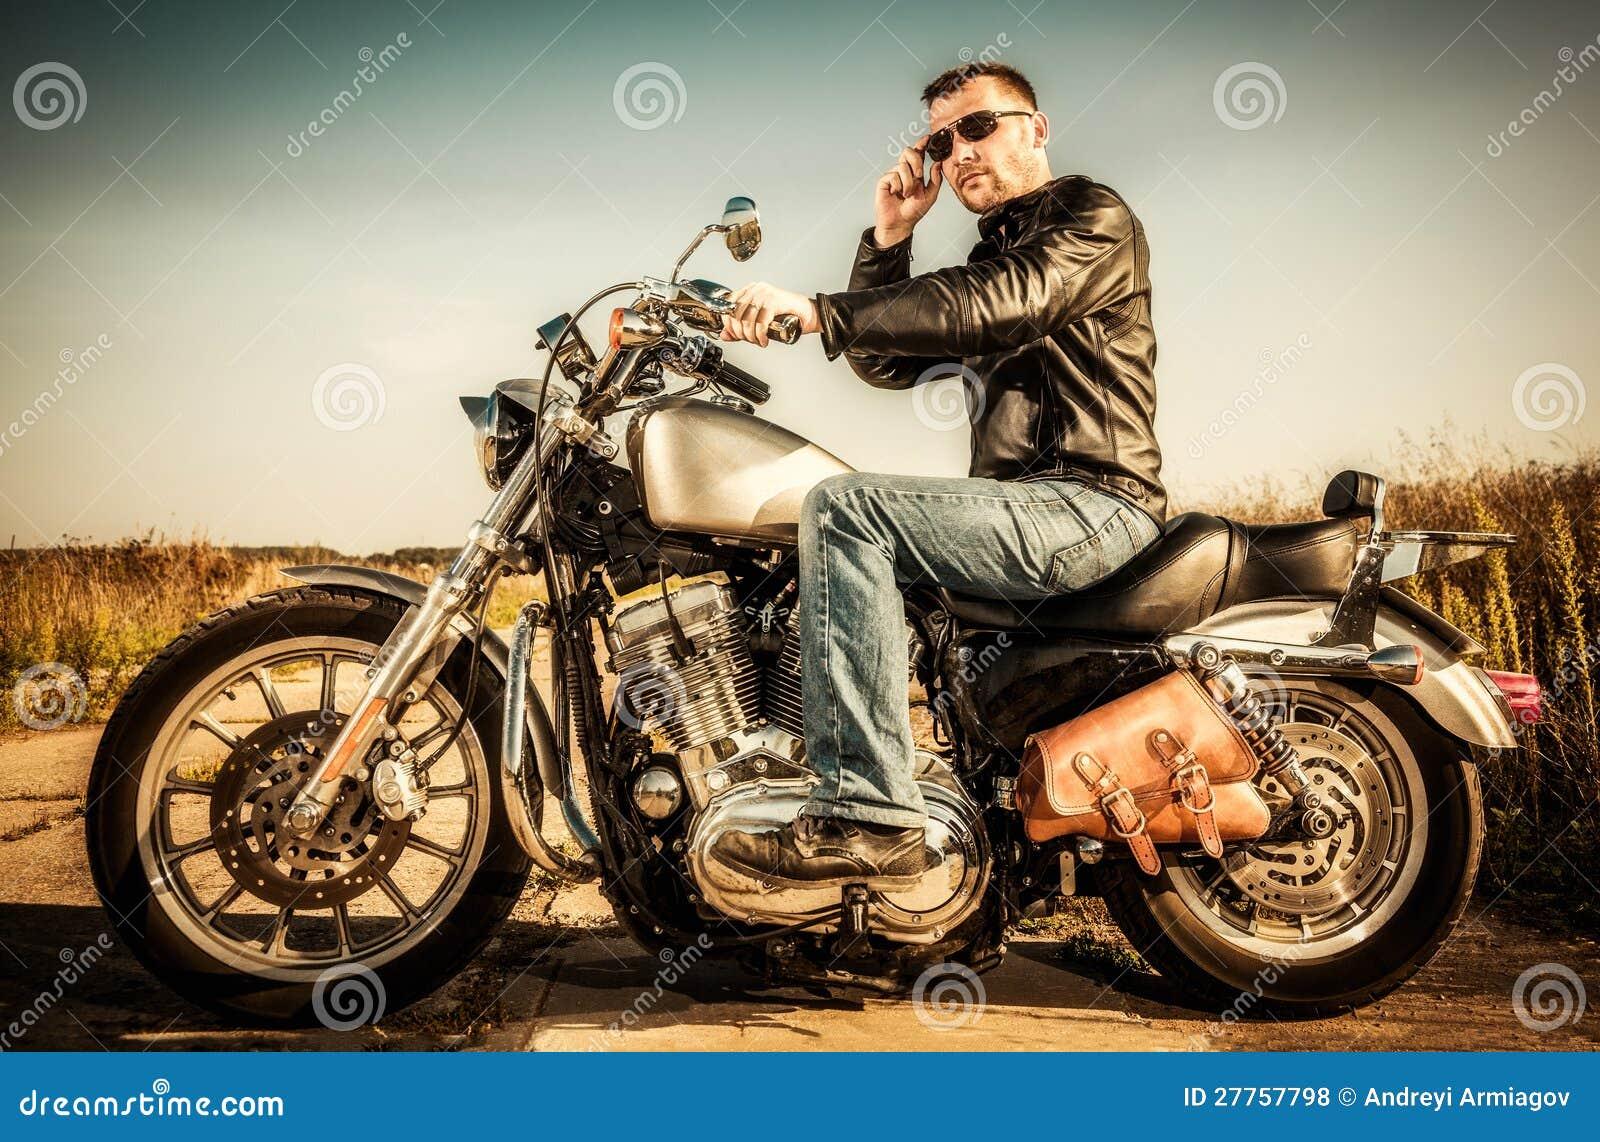 Biker Royalty Free Stock Photos Image 27757798